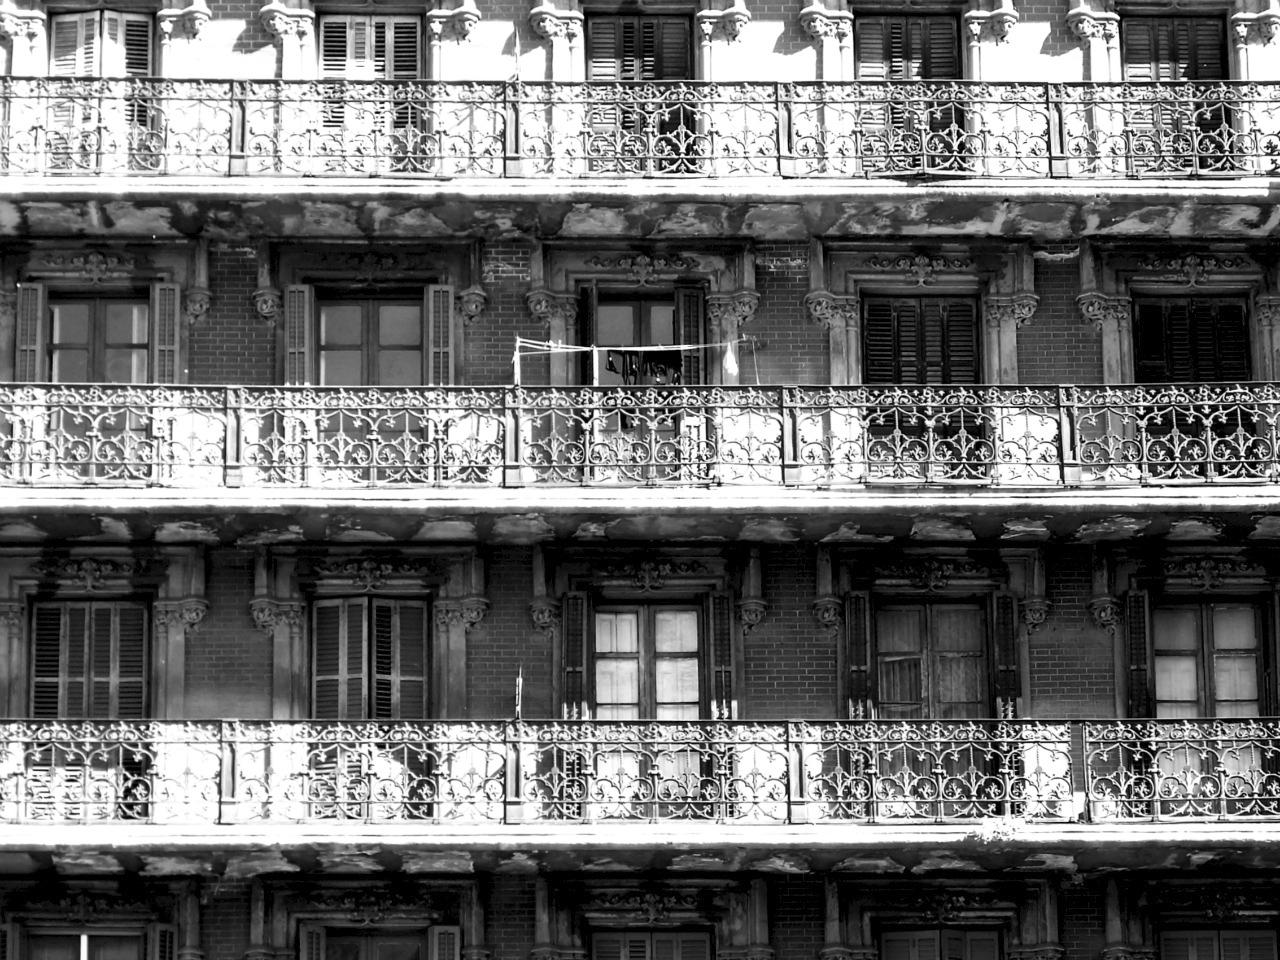 282/365 Barcelona